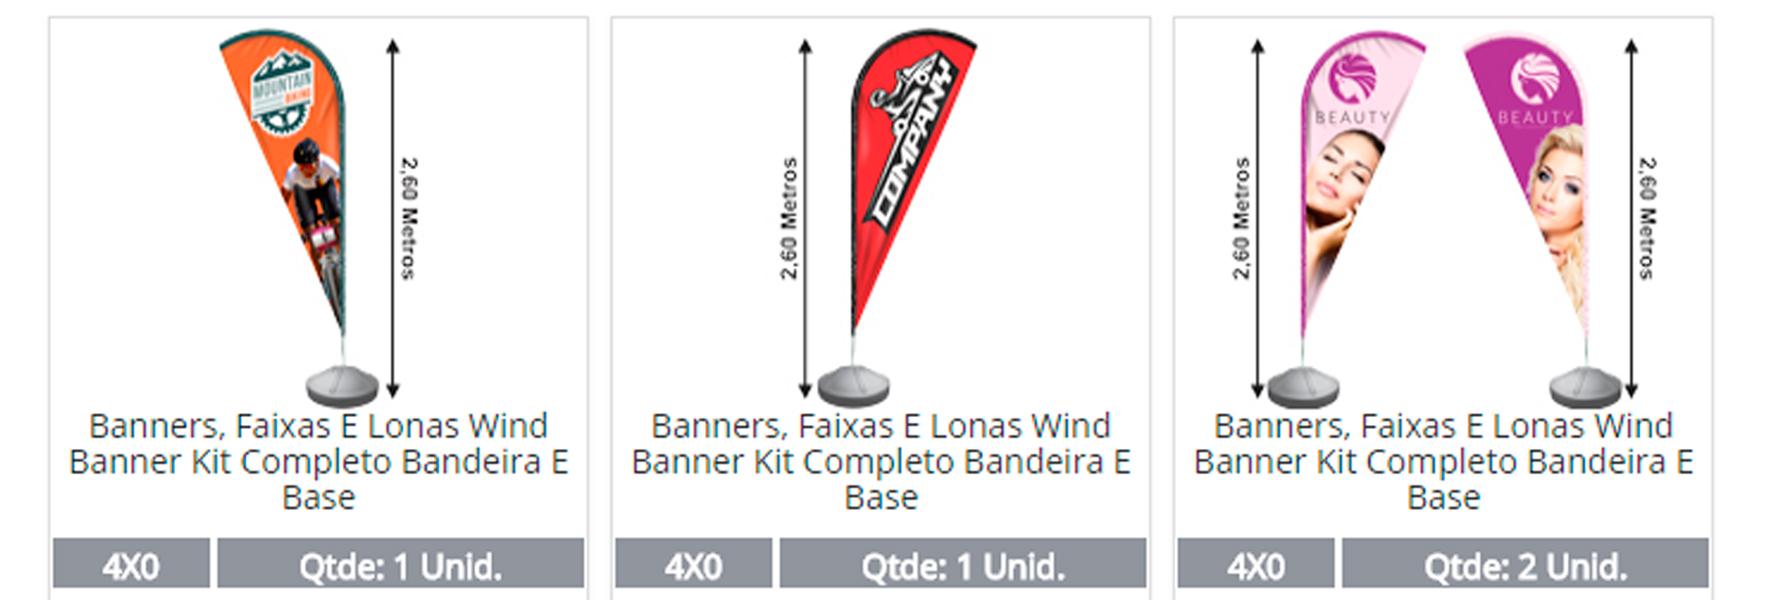 flagball-banner-wind-banner-gota-bhmg